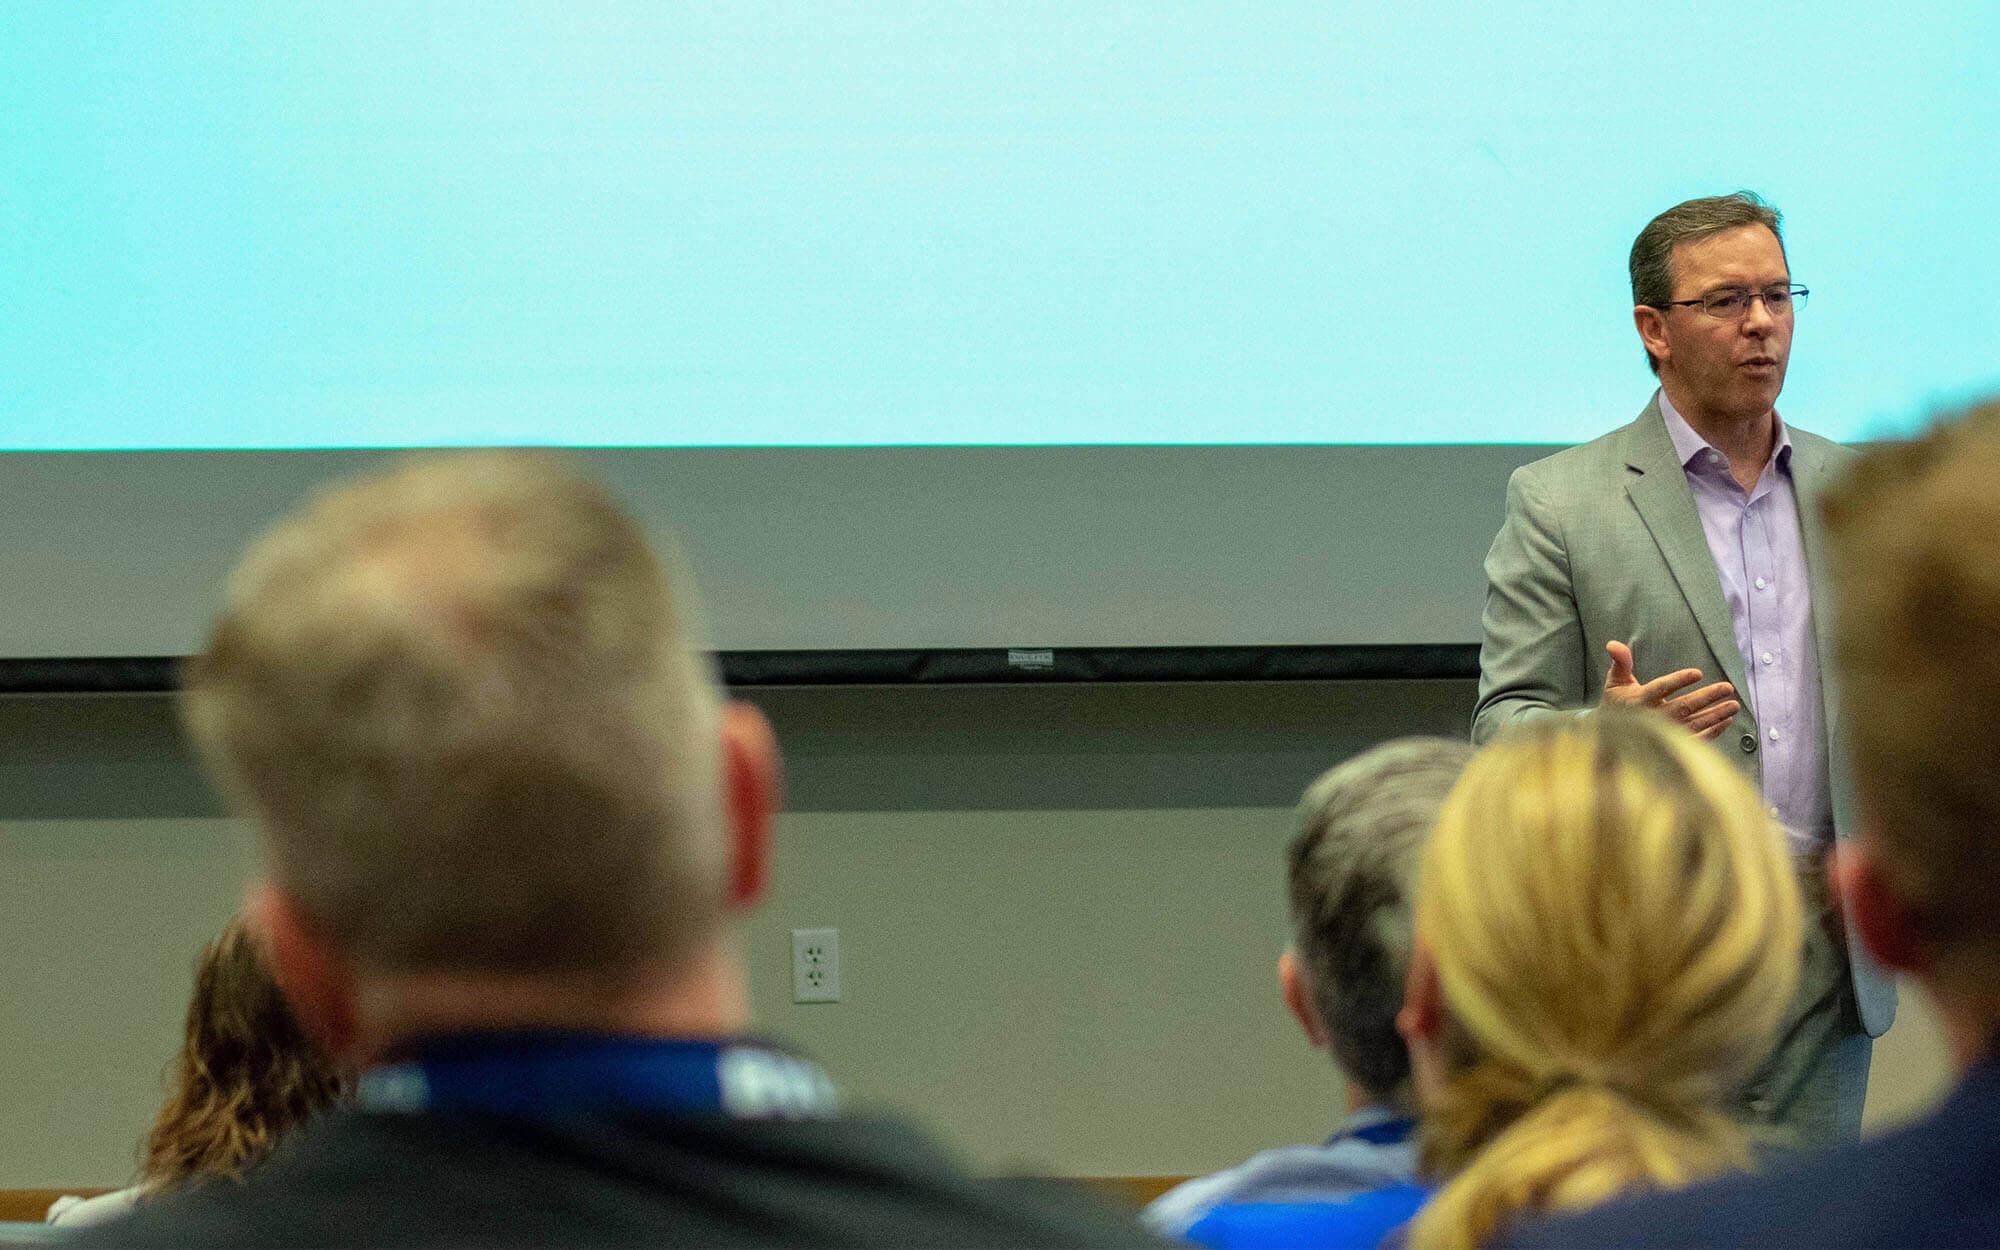 Sports Conference Presenter at BYU EMBA CareerBoost Keynote